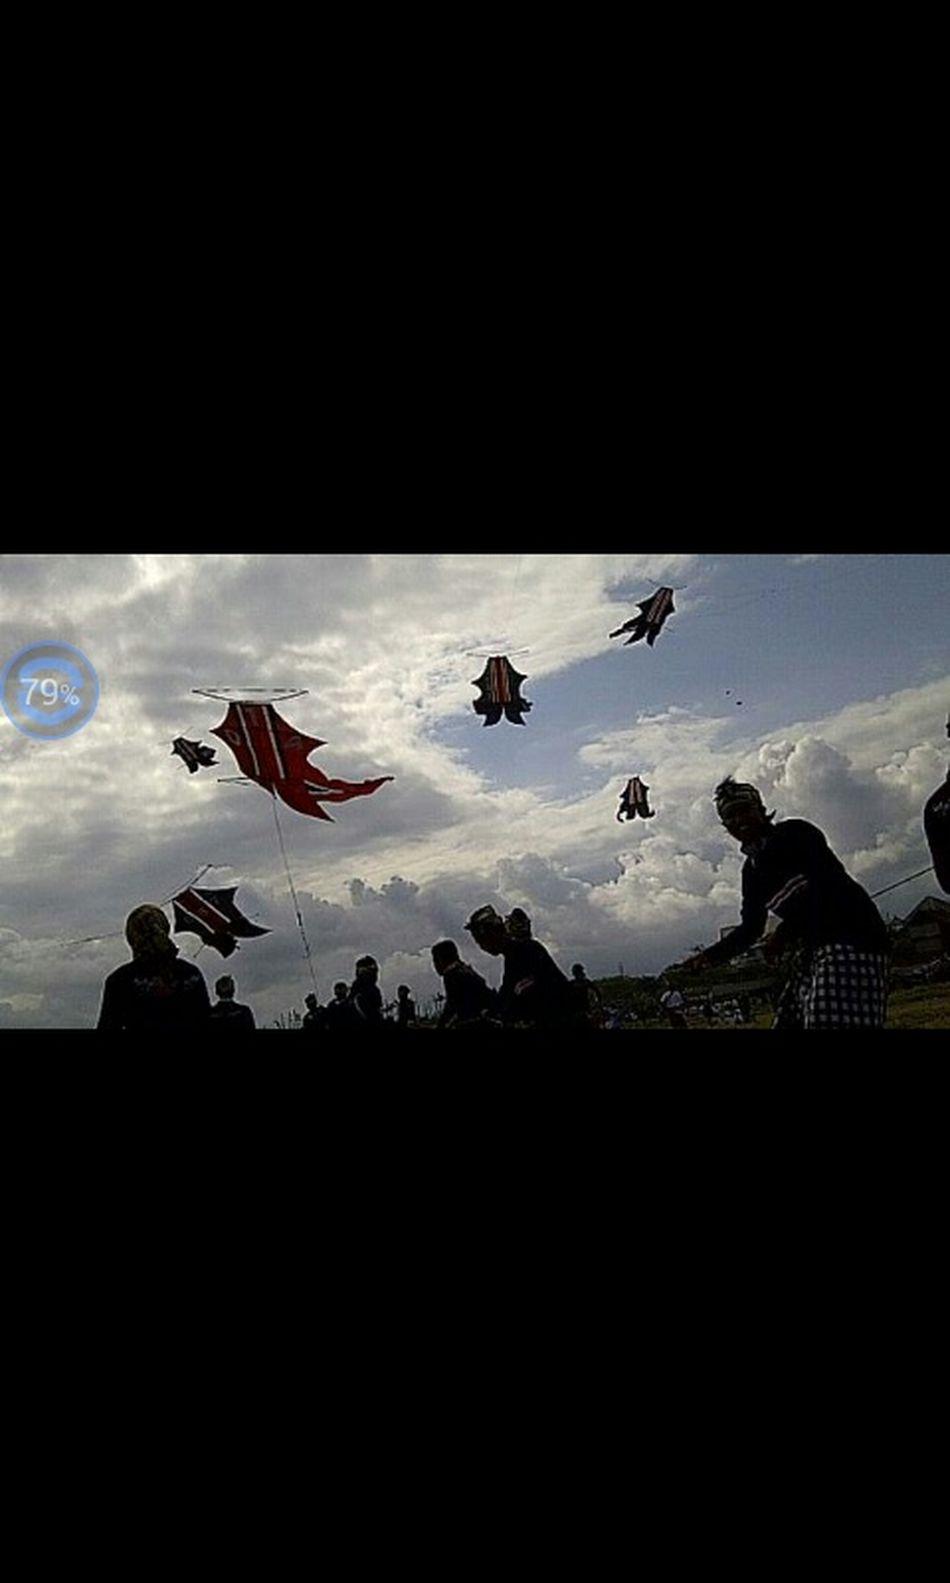 awesome....kite festival in bali